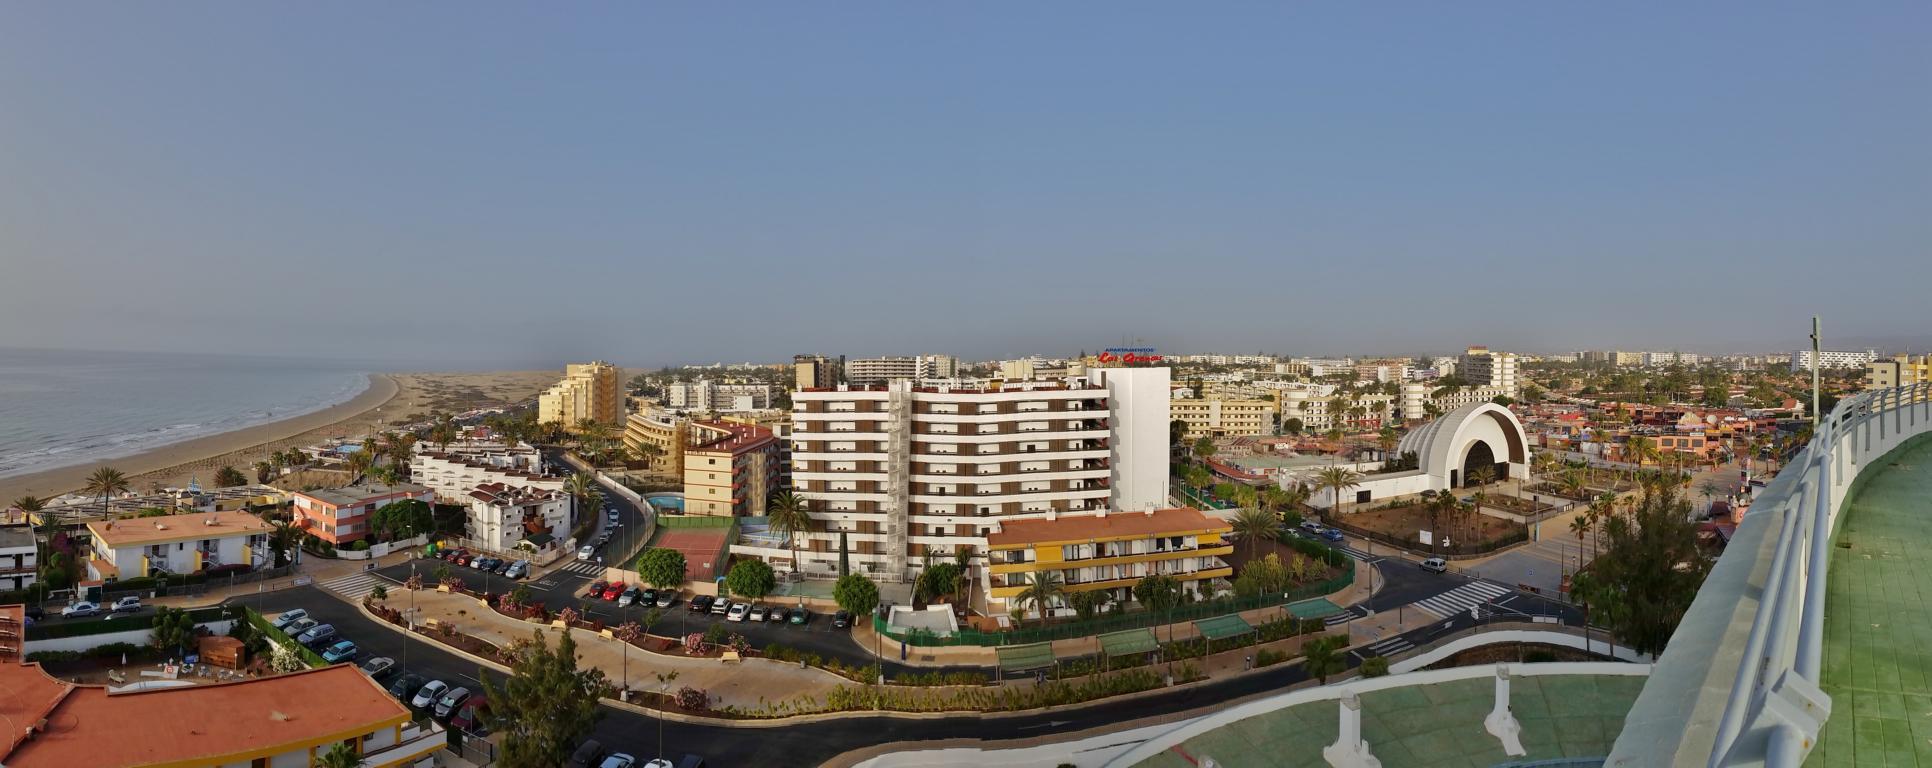 Gran Canaria Mai 2015 (2).JPG